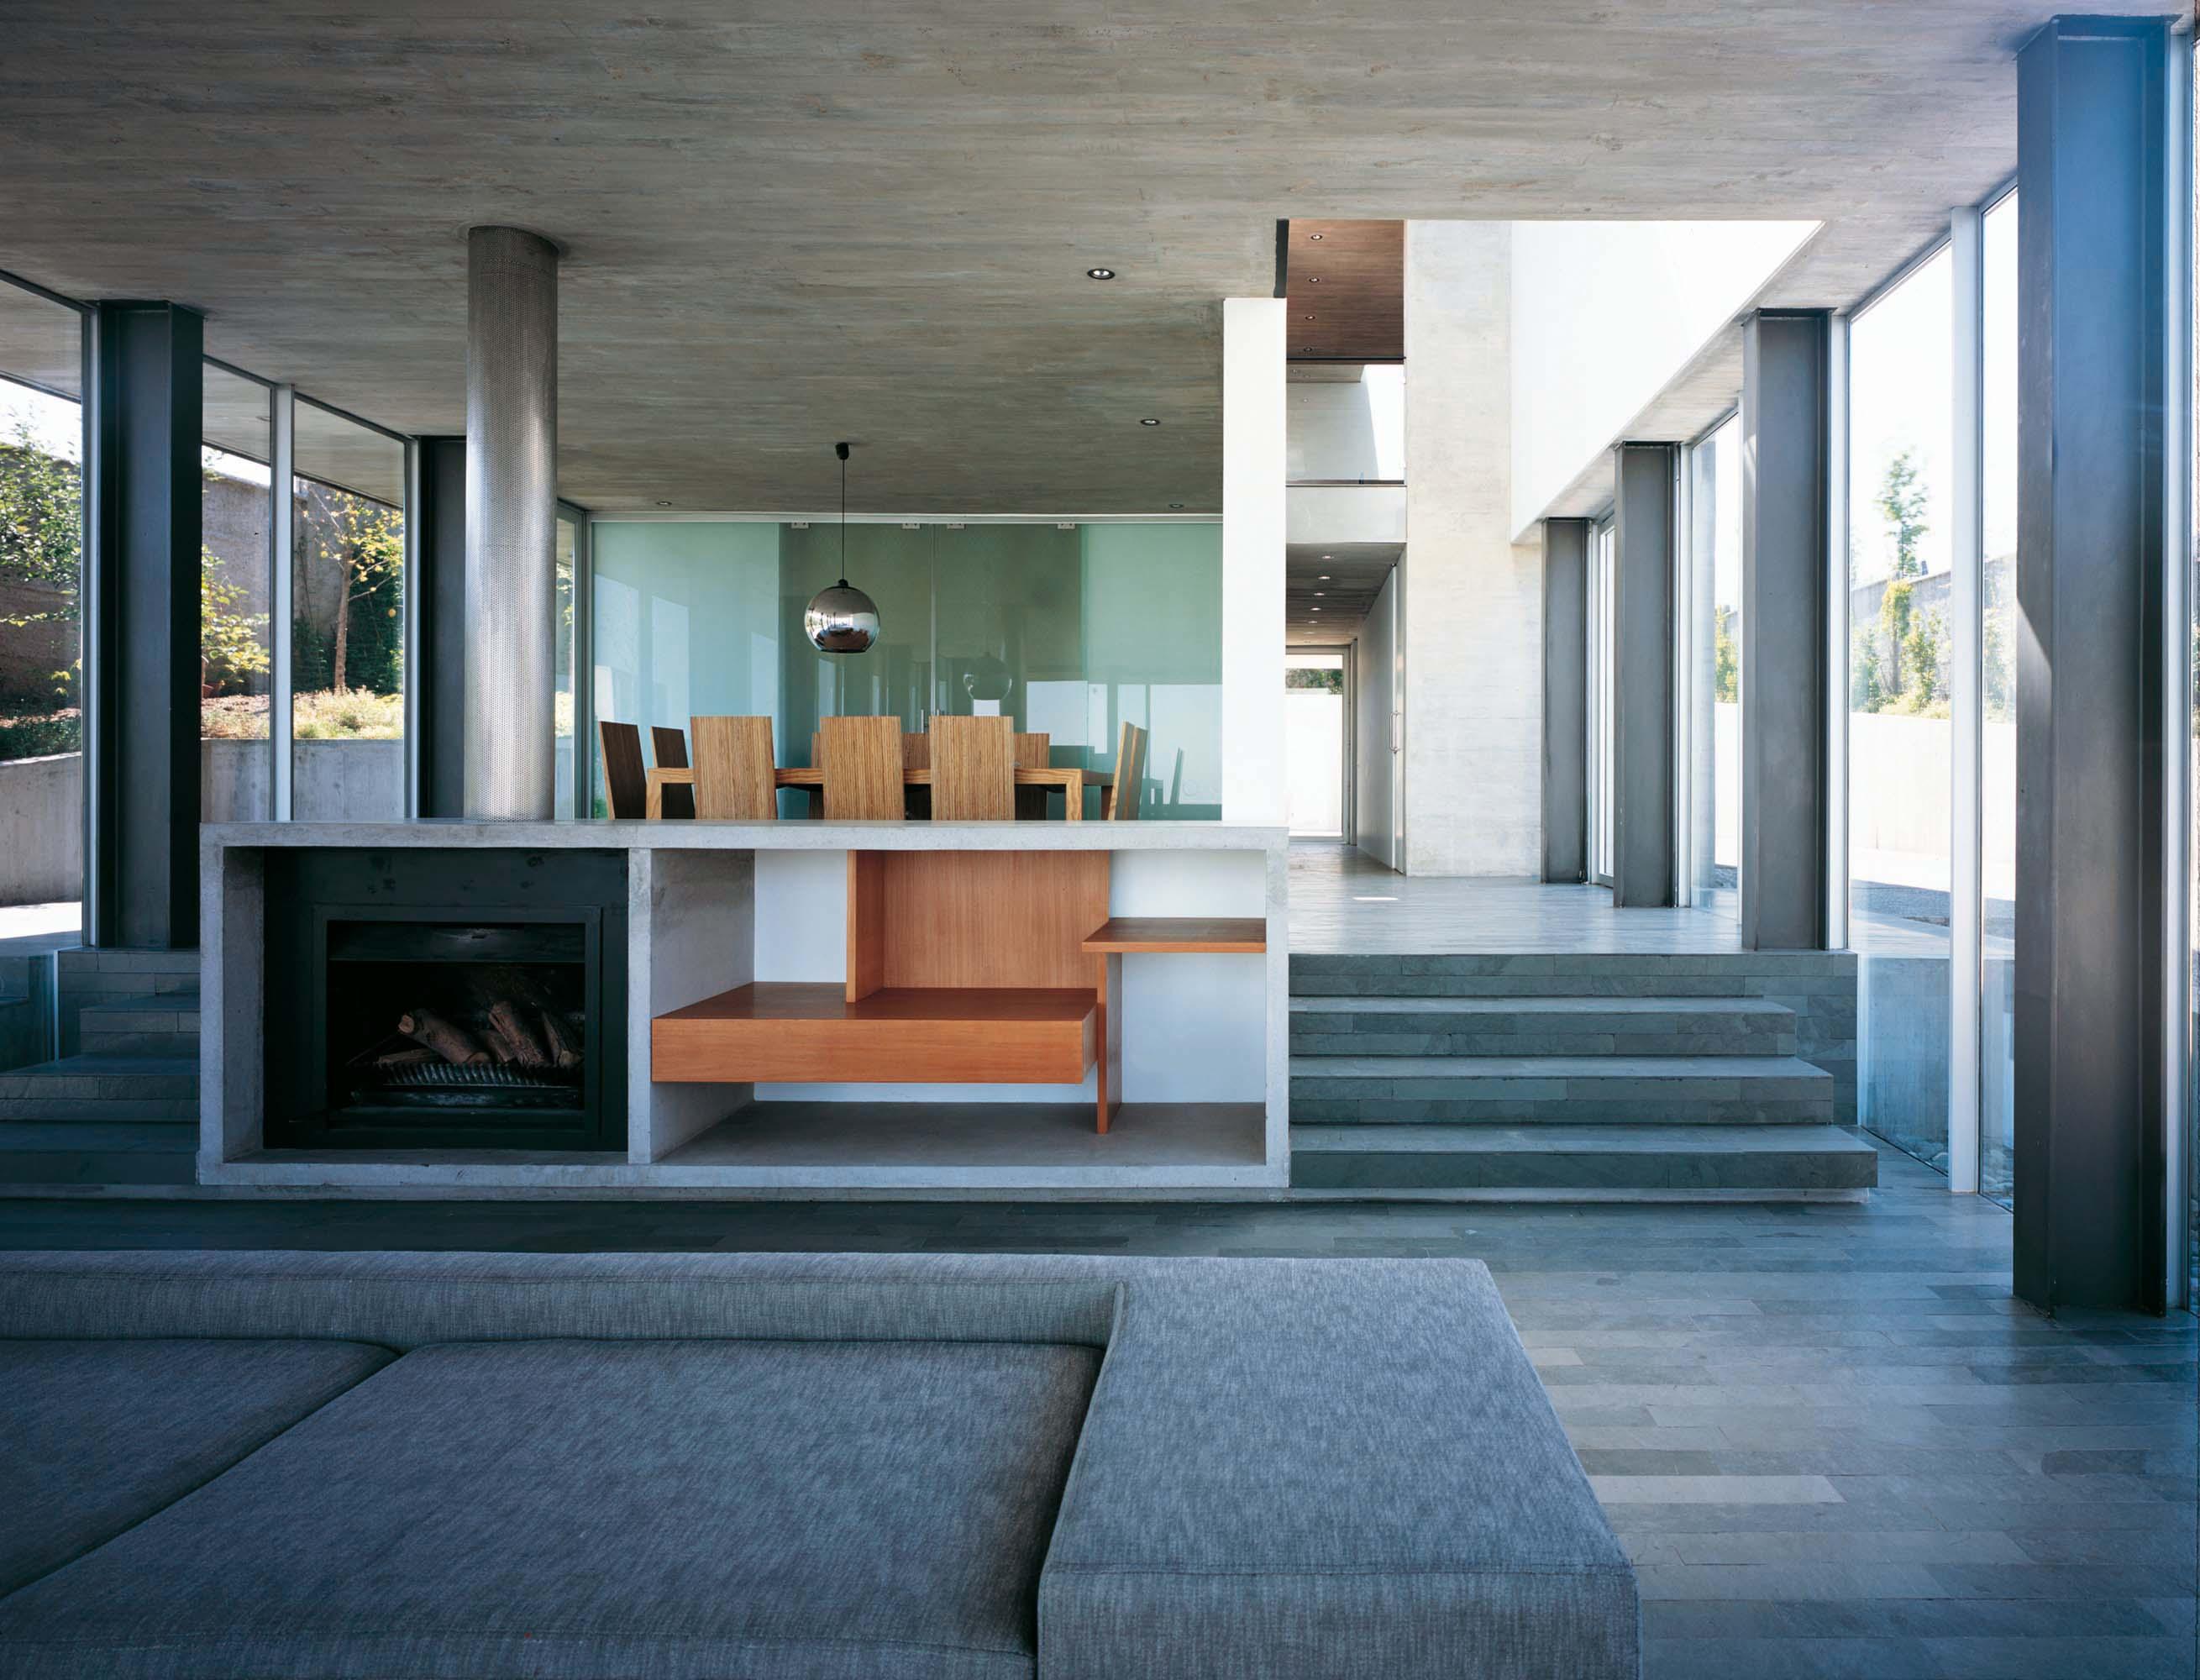 christophe_rousselle_architecte_casa_serrano_15